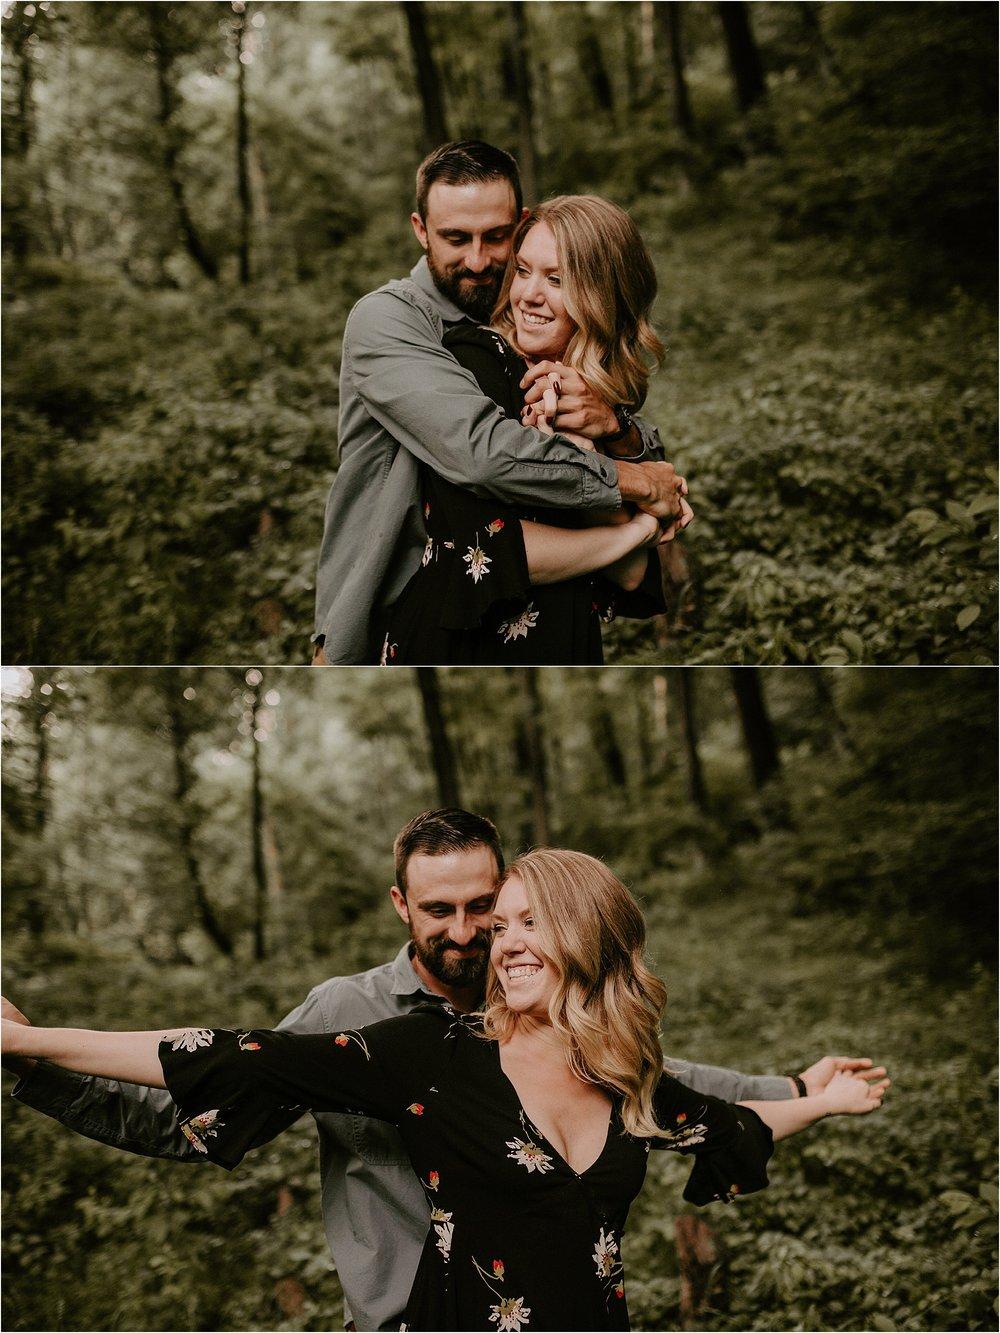 Sarah_Brookhart_Baltimore_Wedding_Photographer_0008.jpg